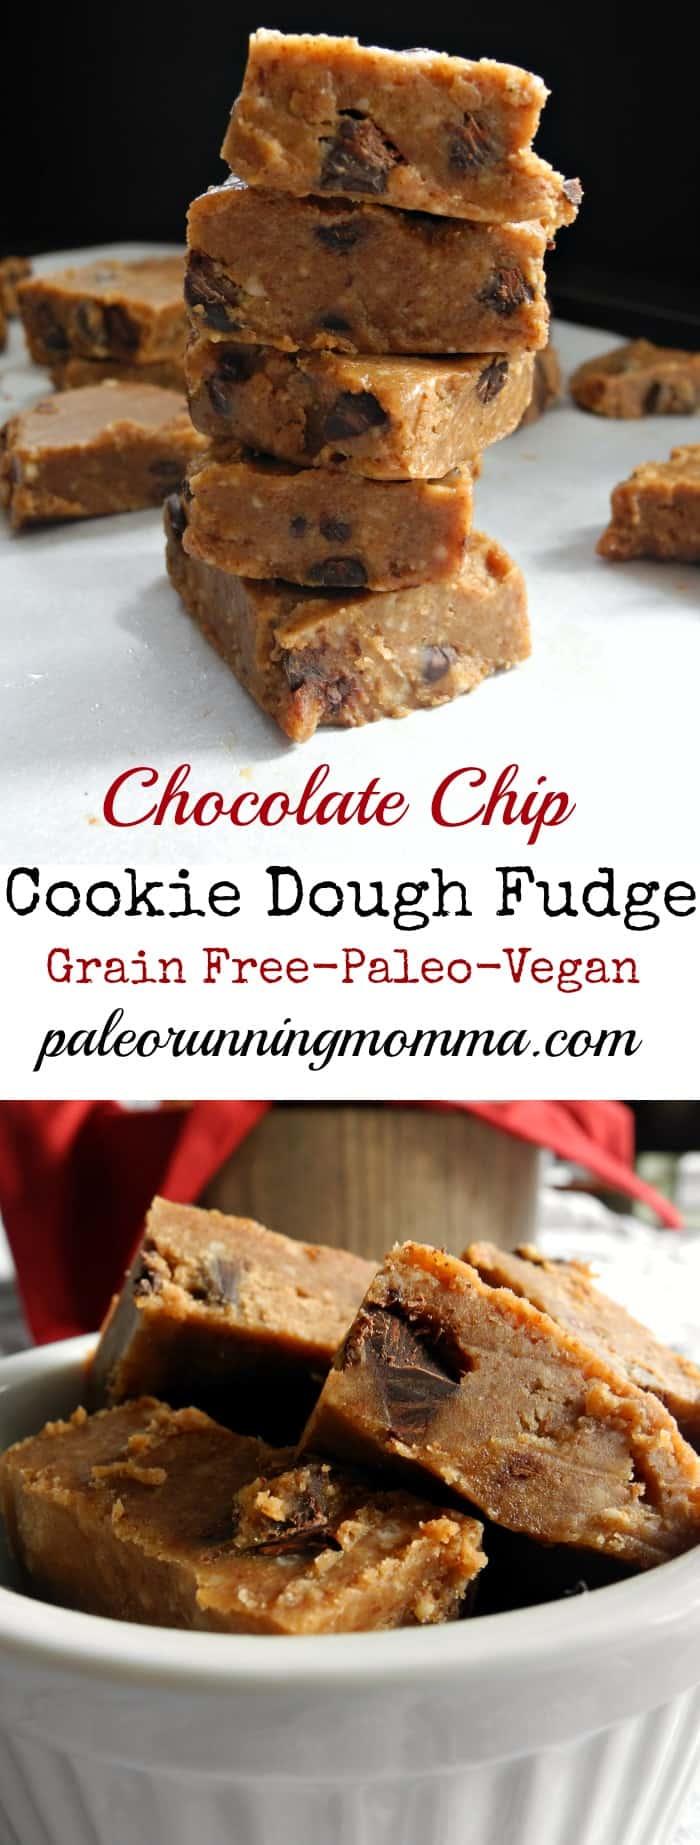 Chocolate Chip Cookie Dough Fudge #glutenfree #grainfree #vegan #paleo